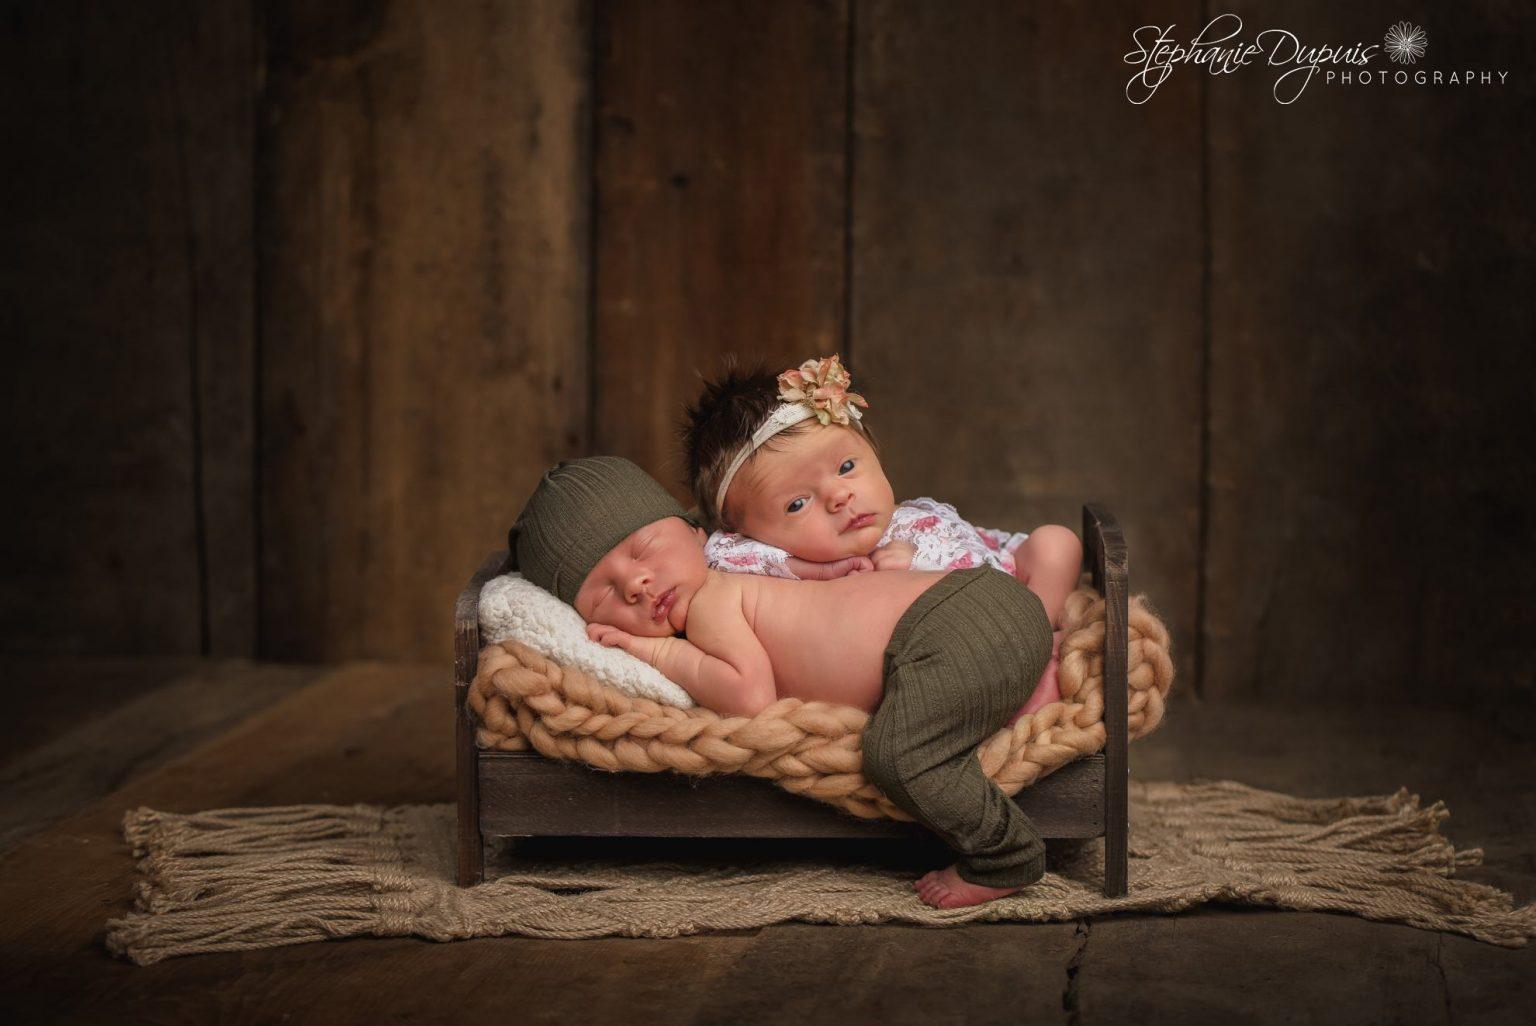 Lena and Asa 8 1536x1026 - Portfolio: Lena & Asa Newborn Session